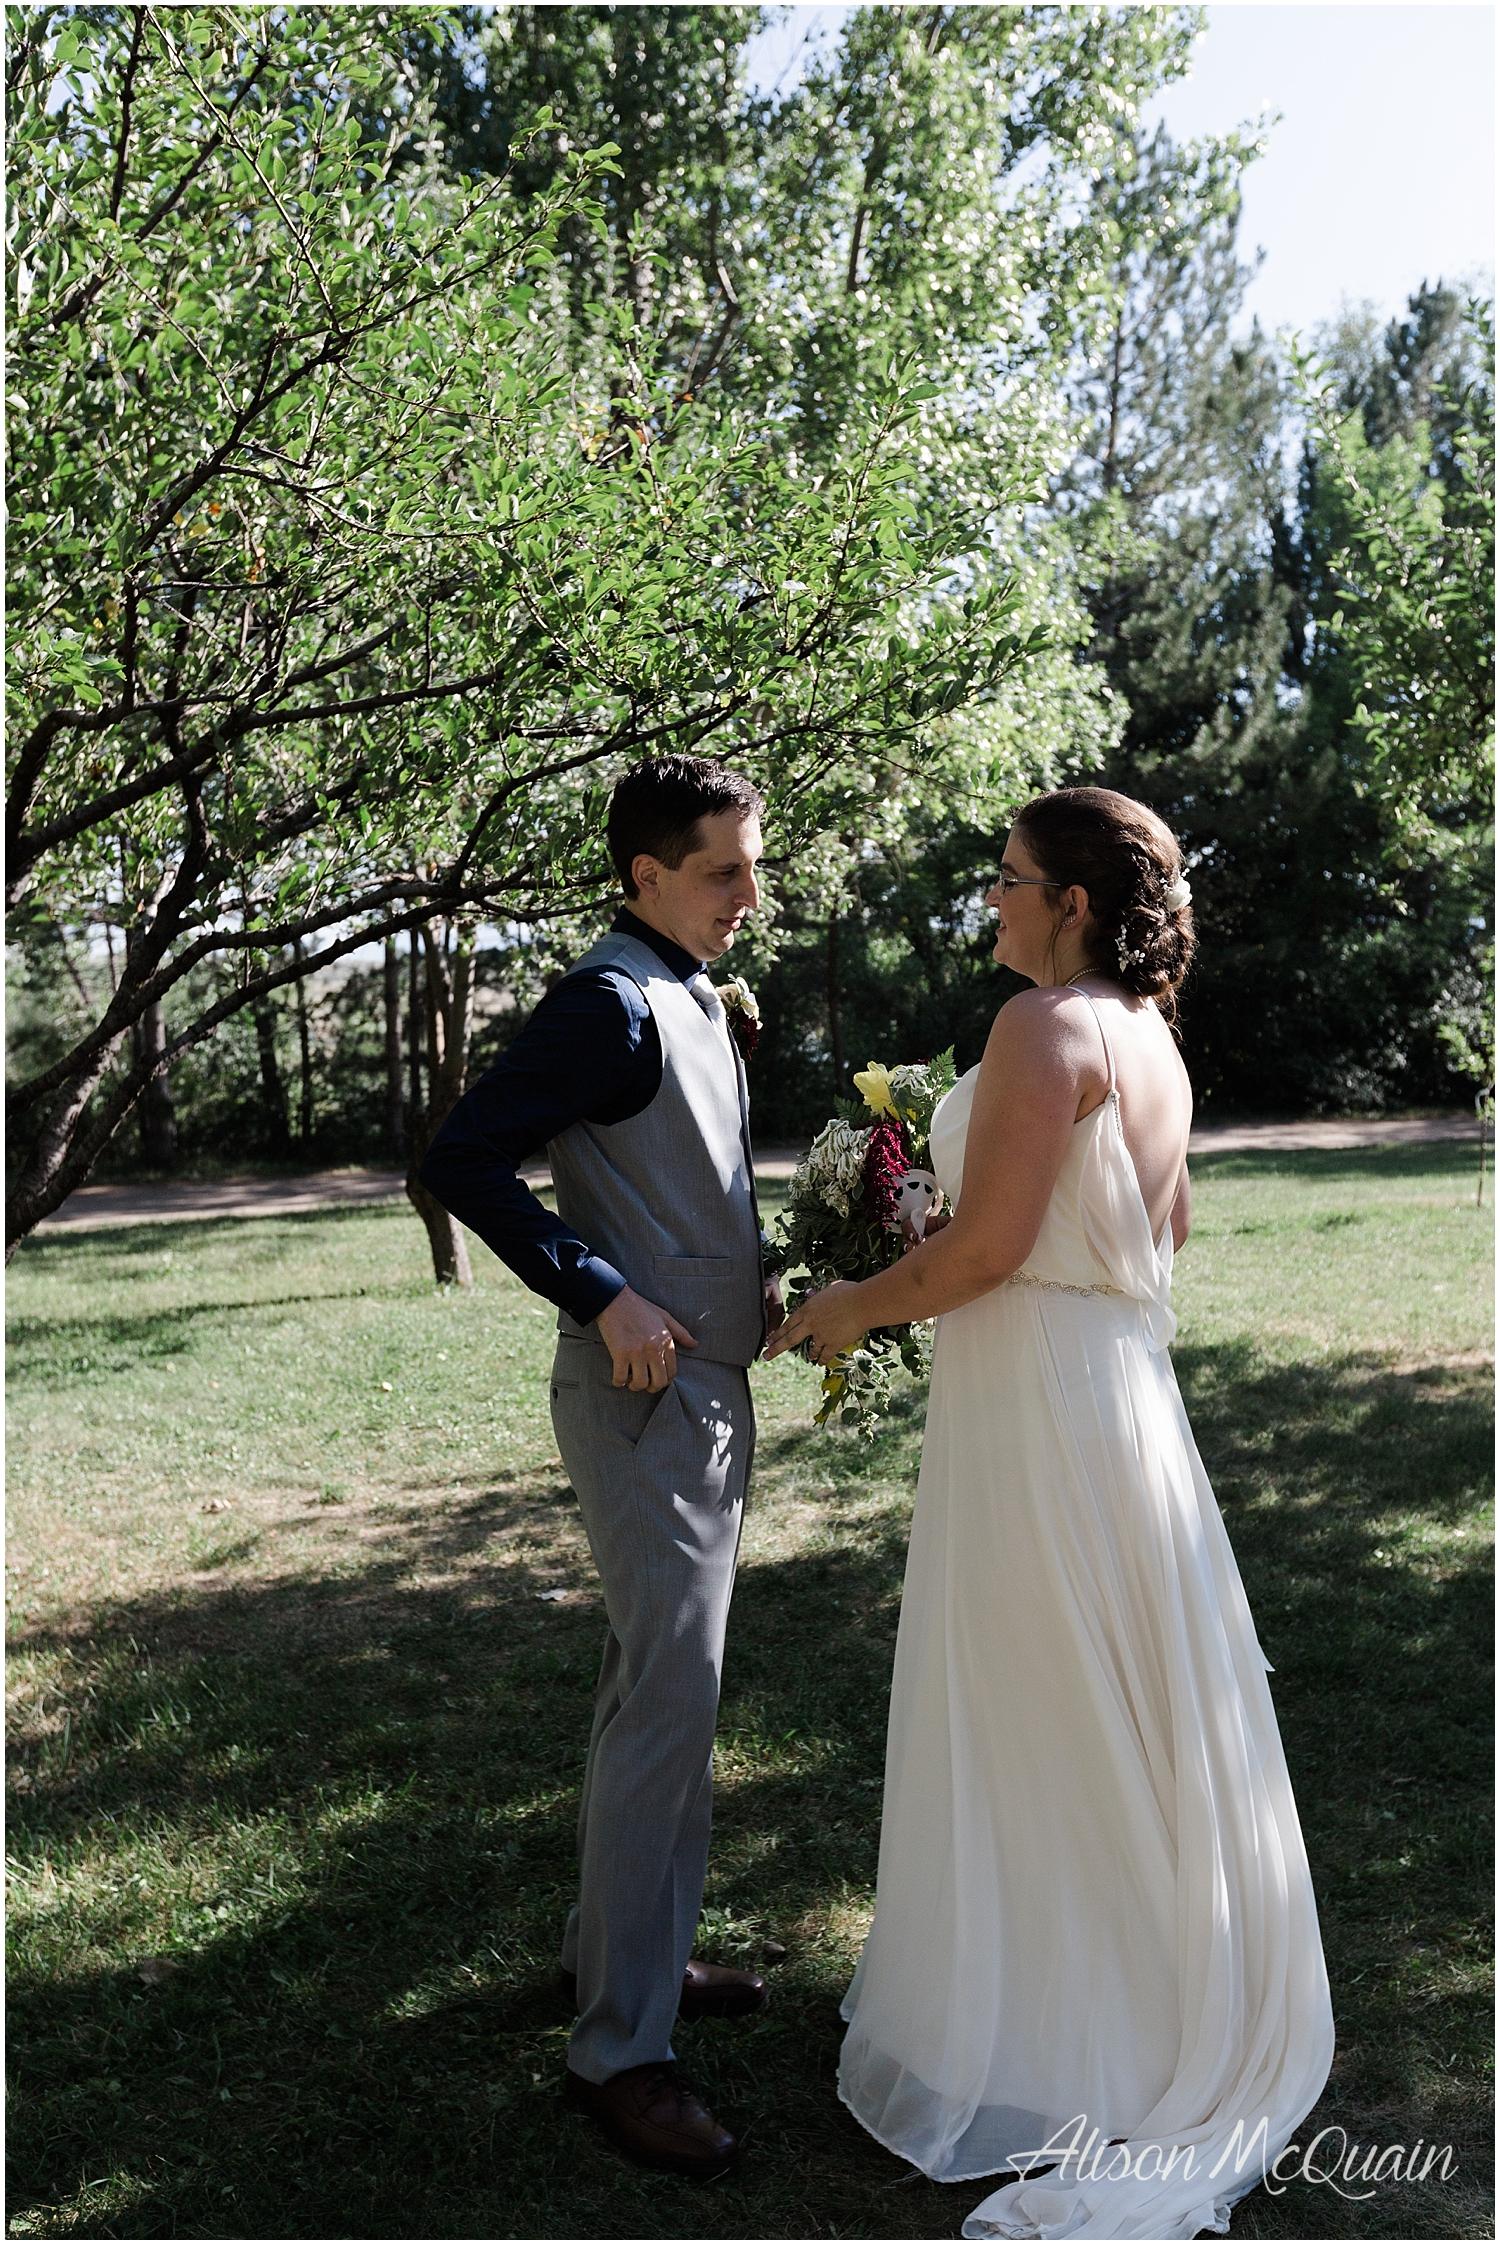 AandJSteb_Longmont_Colorado_Wedding_AMPhoto_Aug2018_0038.jpg